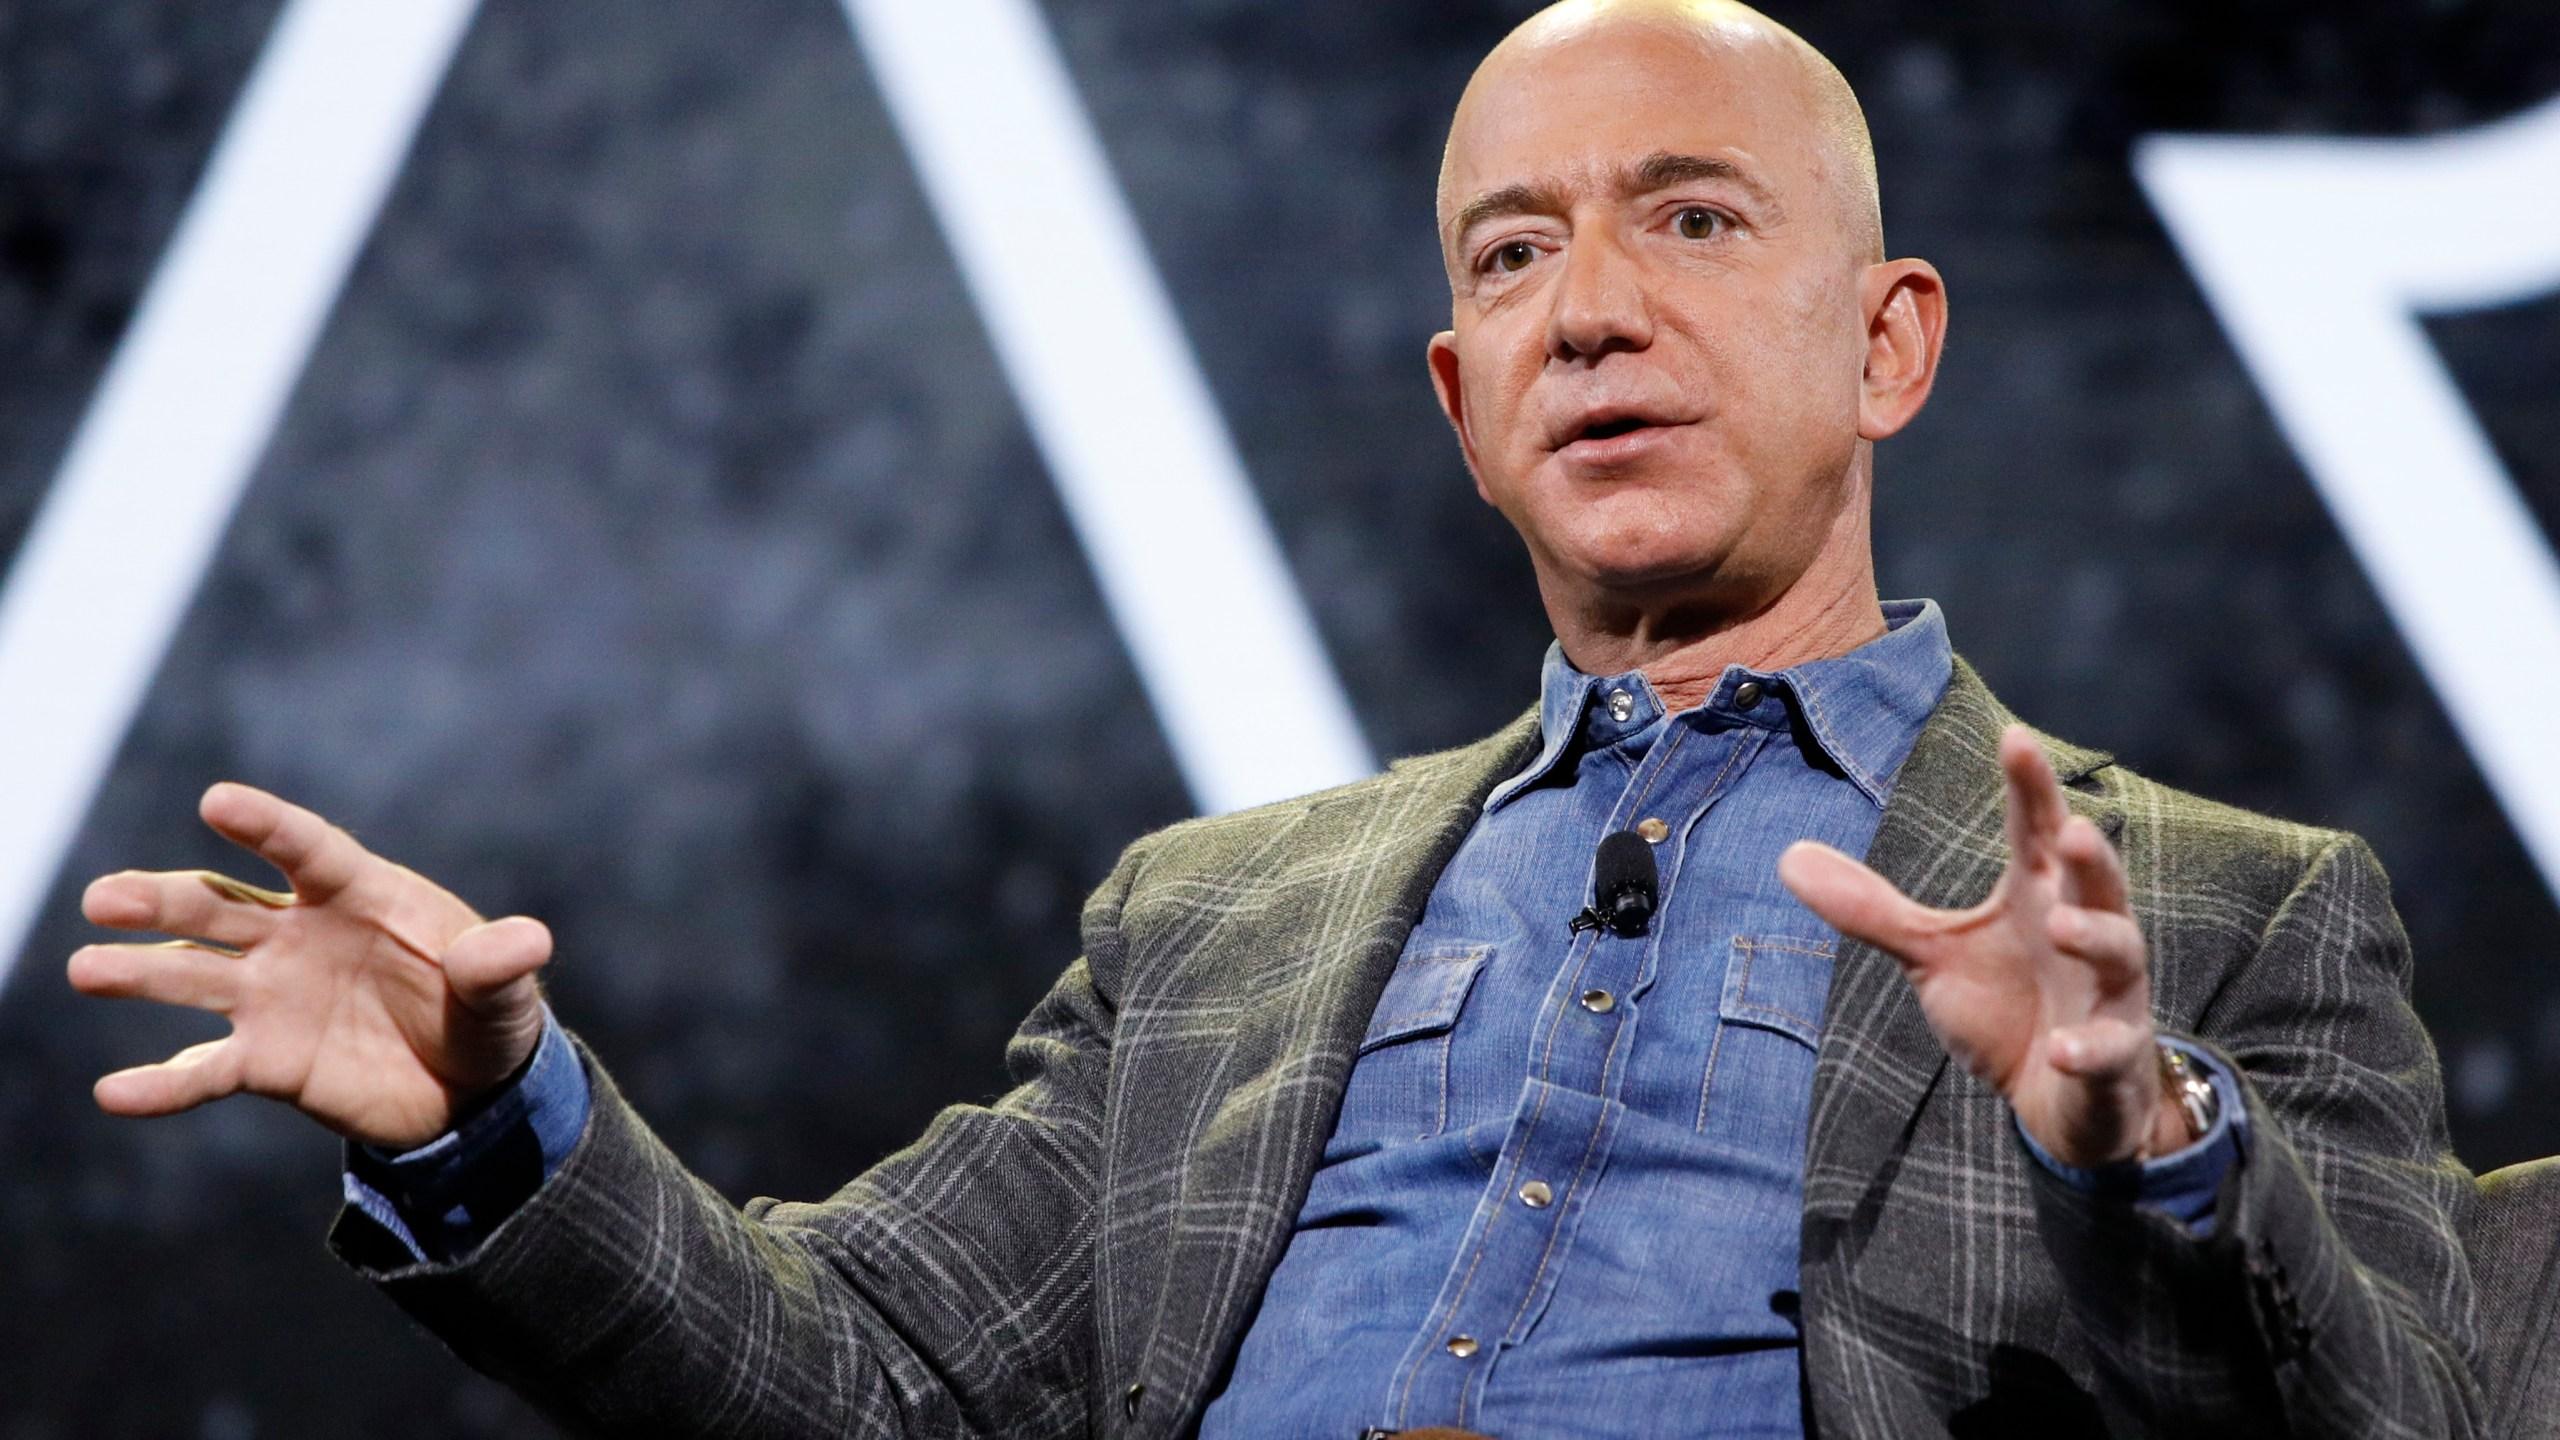 Amazon CEO Jeff Bezos speaks at the the Amazon re:MARS convention in Las Vegas on June 6, 2019. (John Locher / Associated Press)